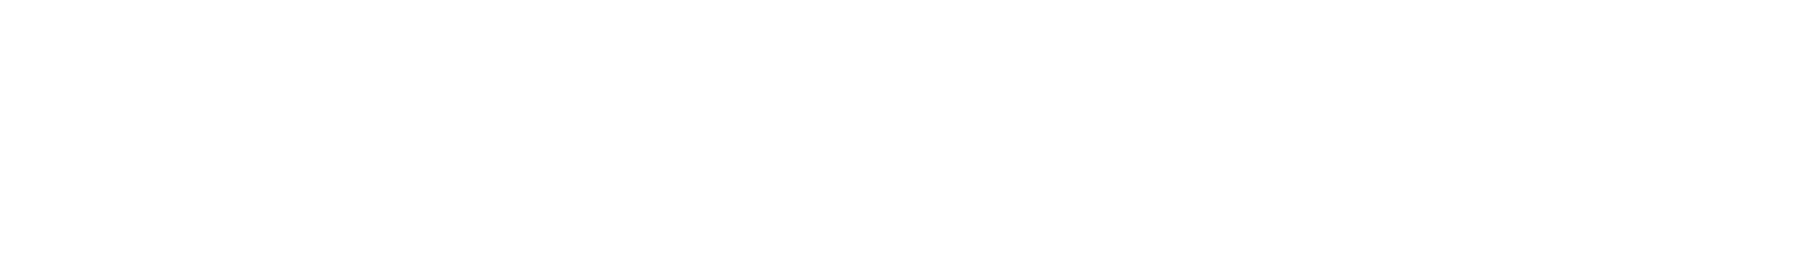 vedh synth cut 016 gm9